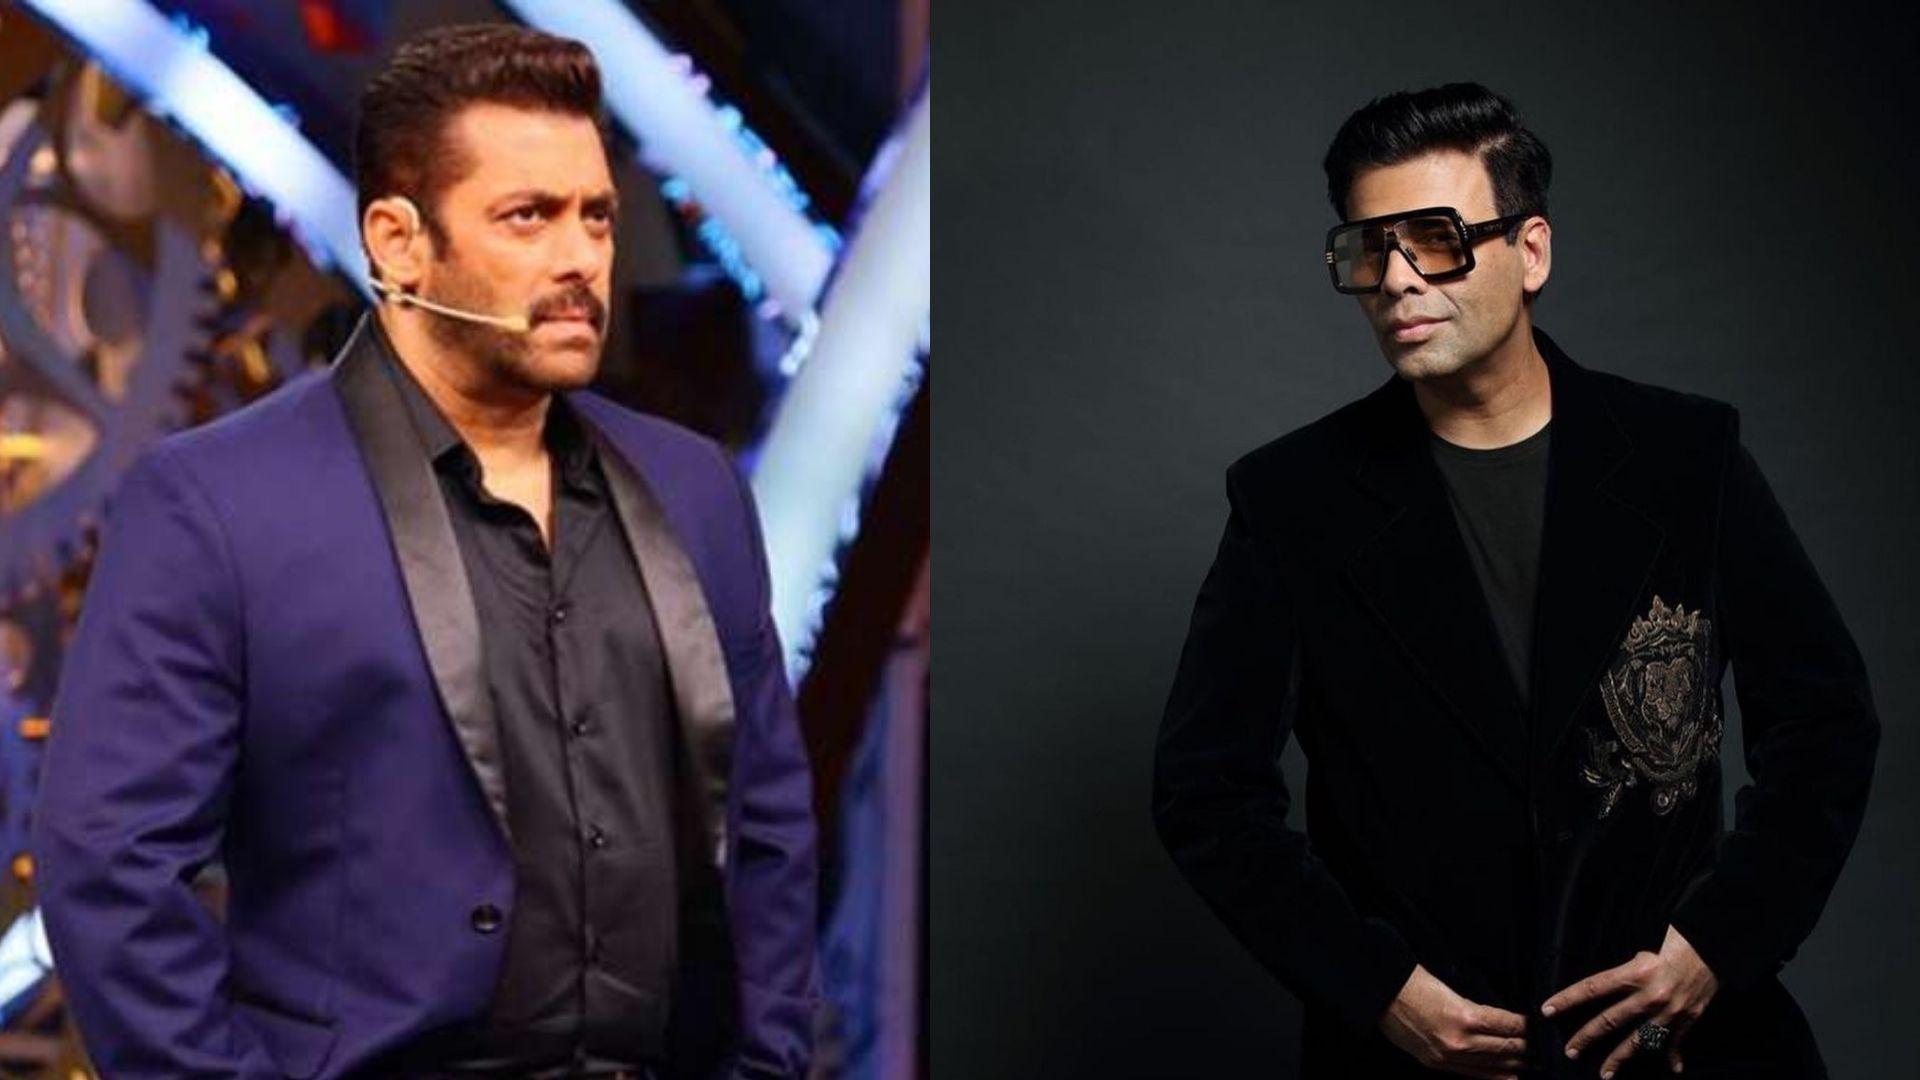 Bigg Boss 15 Weekend Ka Vaar: Salman Khan Slams Gharwasis, Says 'Mein Karan Johar Nahi Hu, Hehe Karke Baat Khatam Kar Dunga'